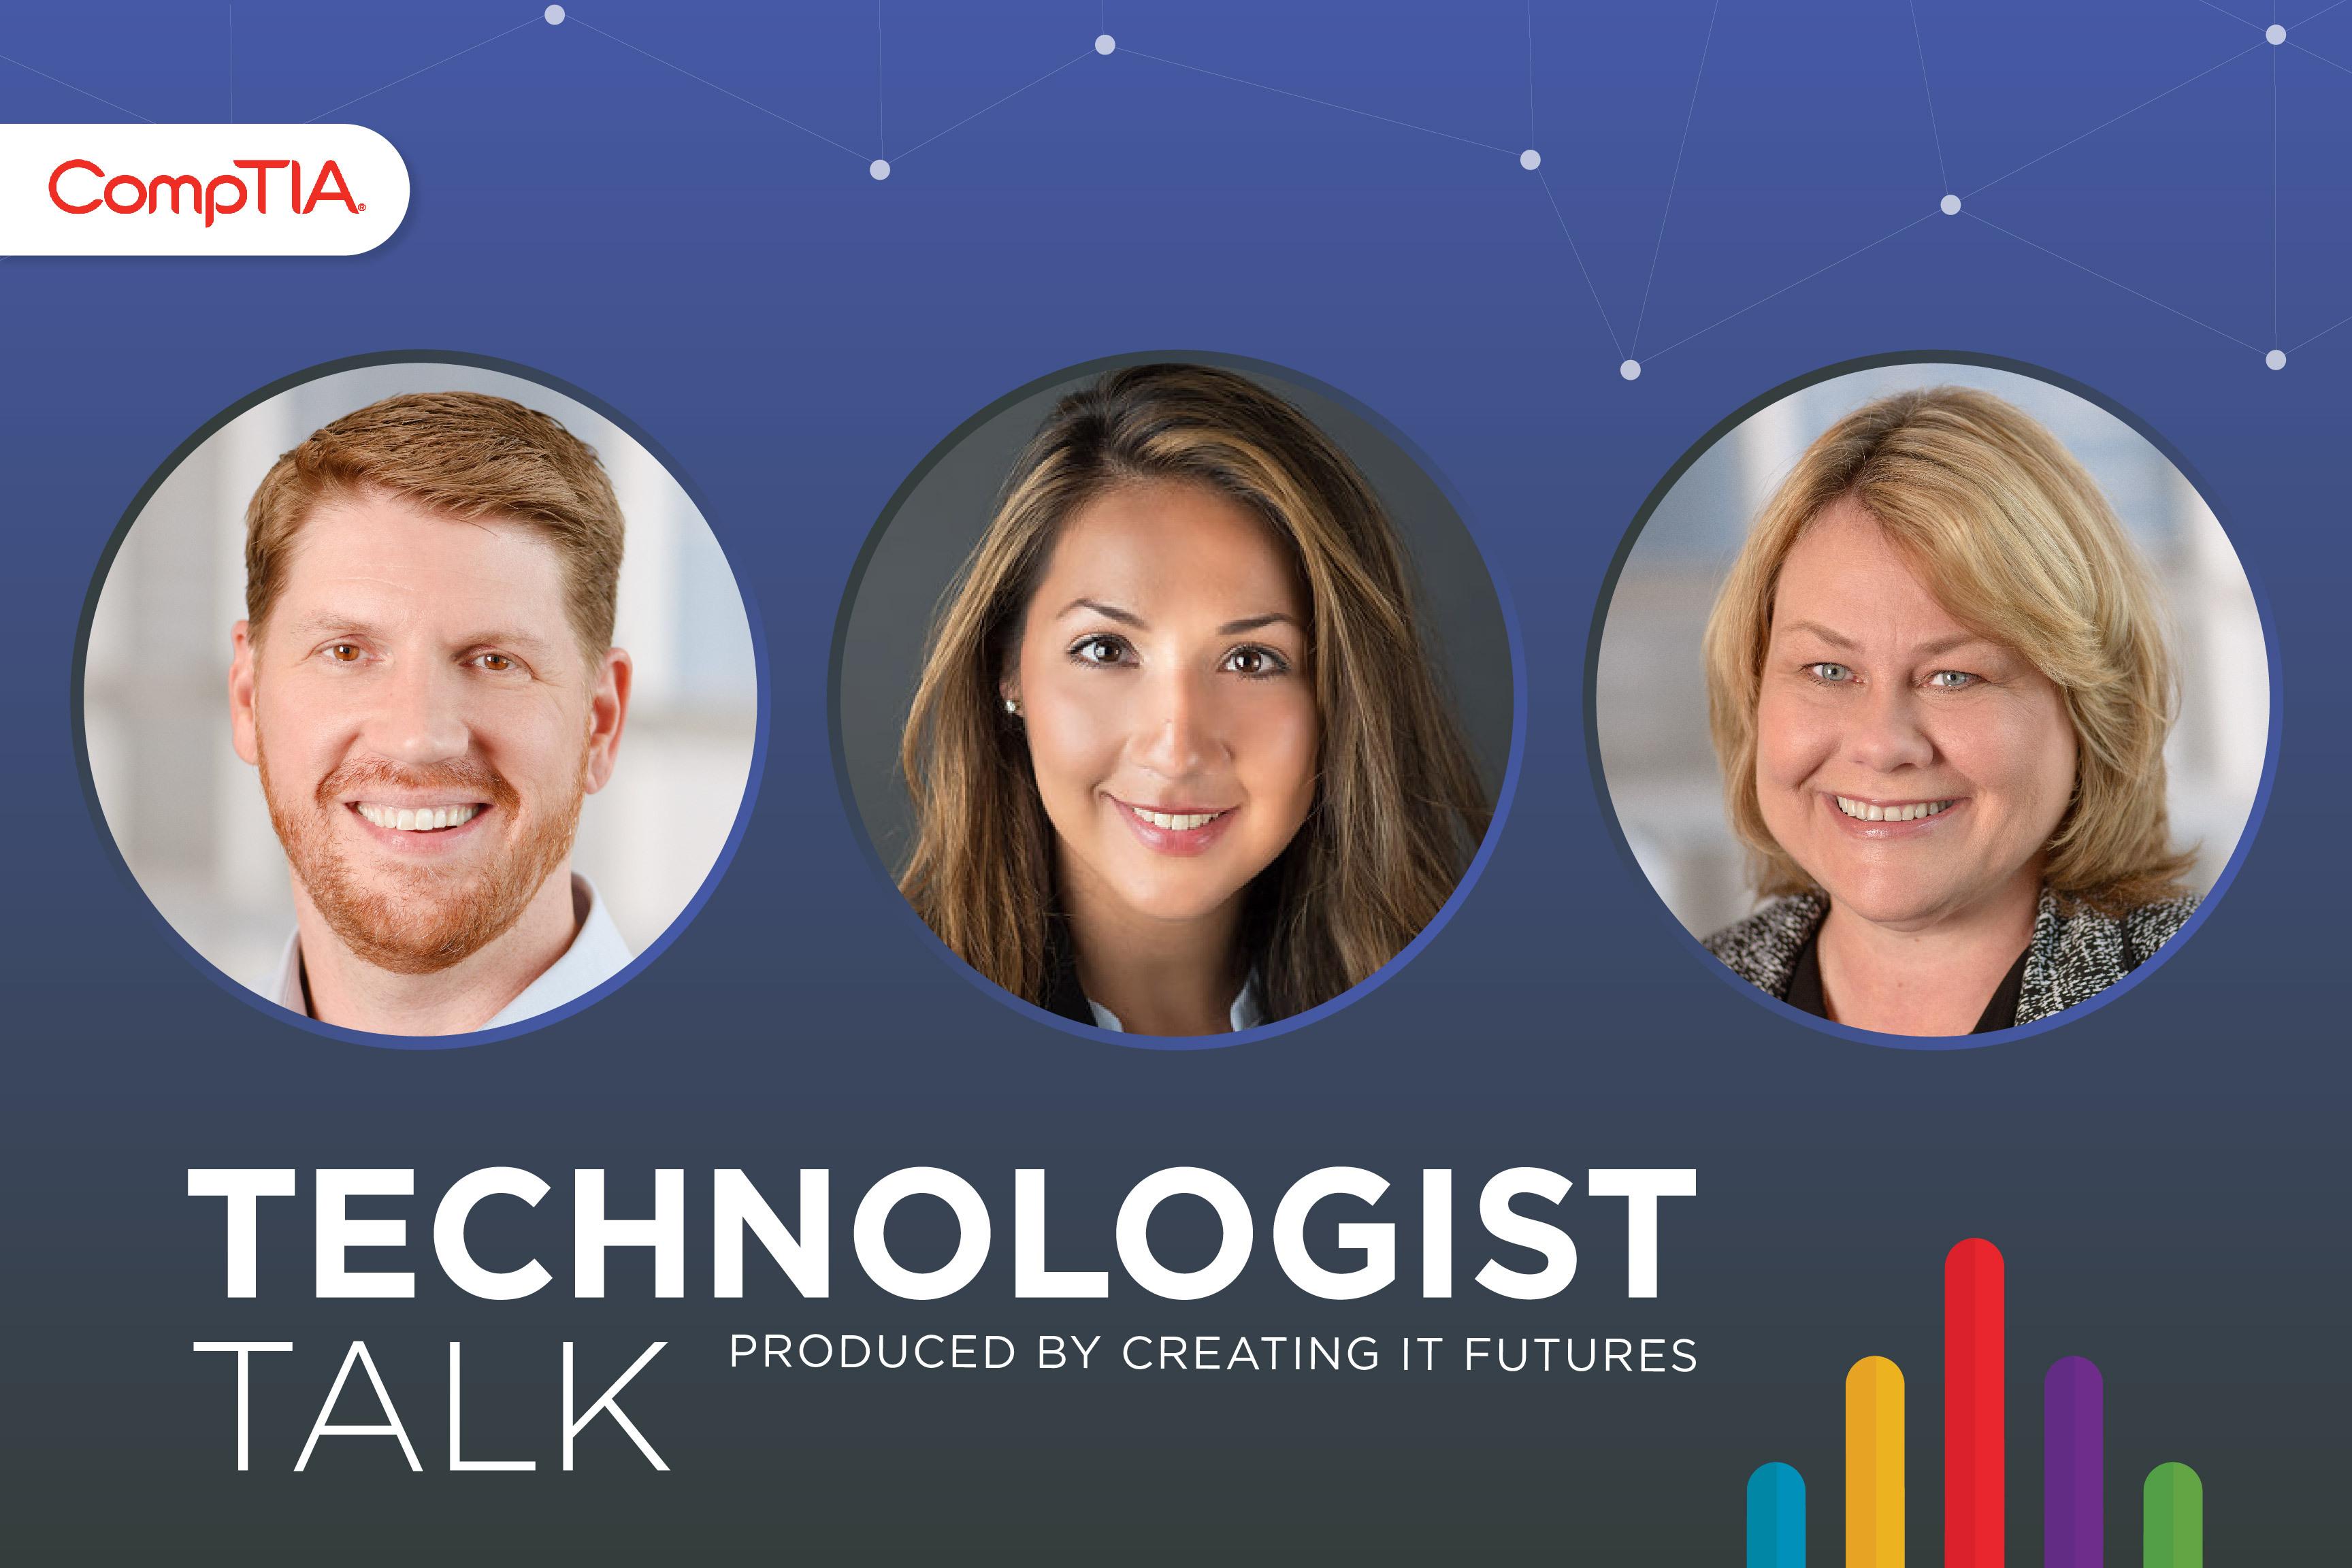 Charles Eaton - Andrea McMillian - Nancy Hammervik on Technologist Talk